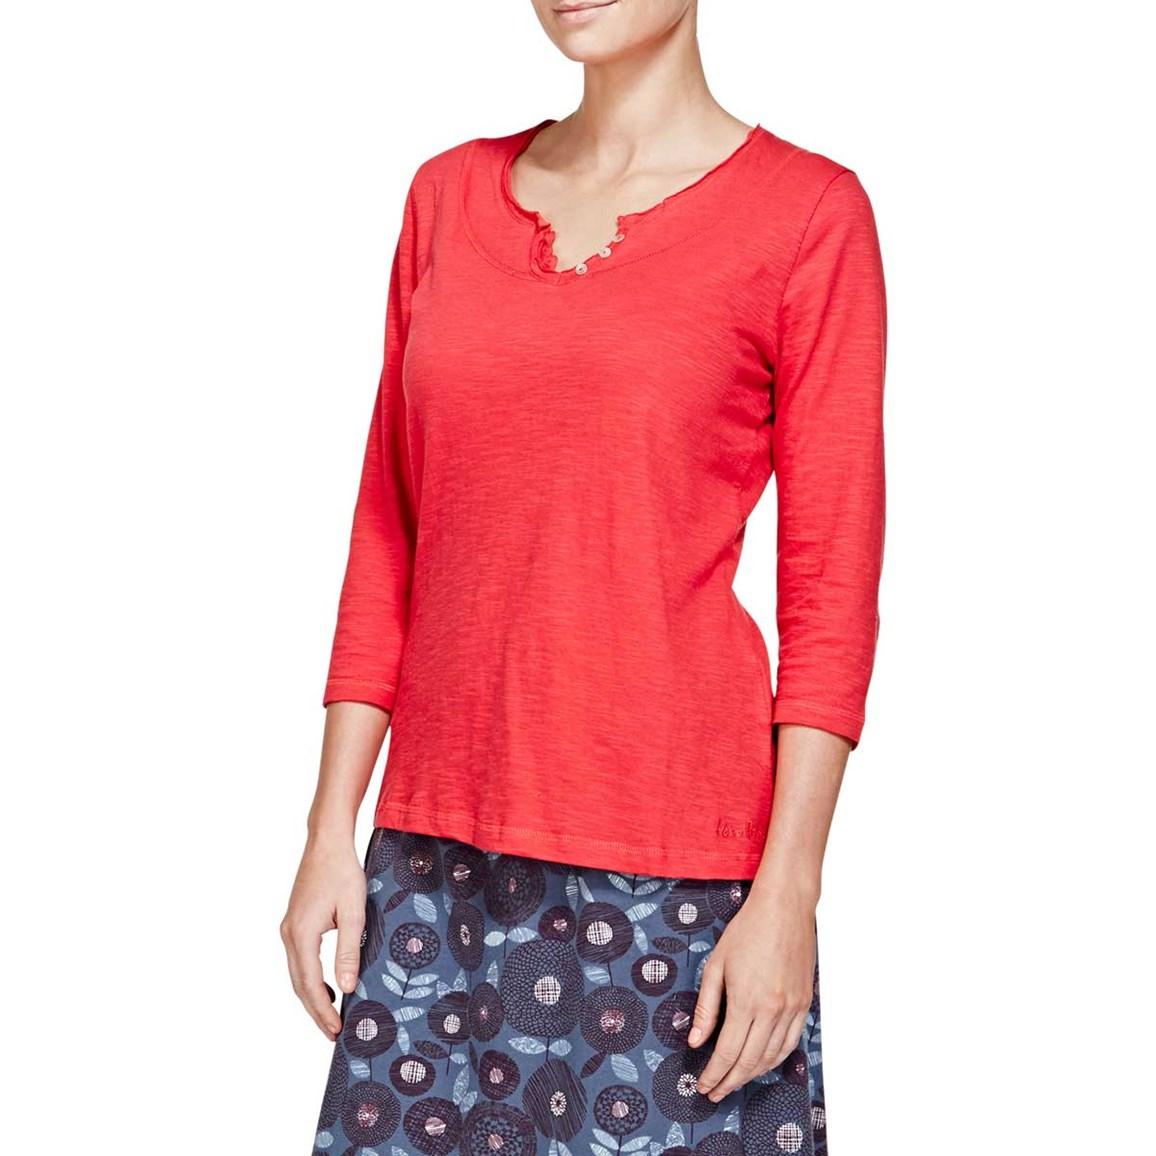 Petra 3/4 Sleeve Plain T-Shirt Foxberry